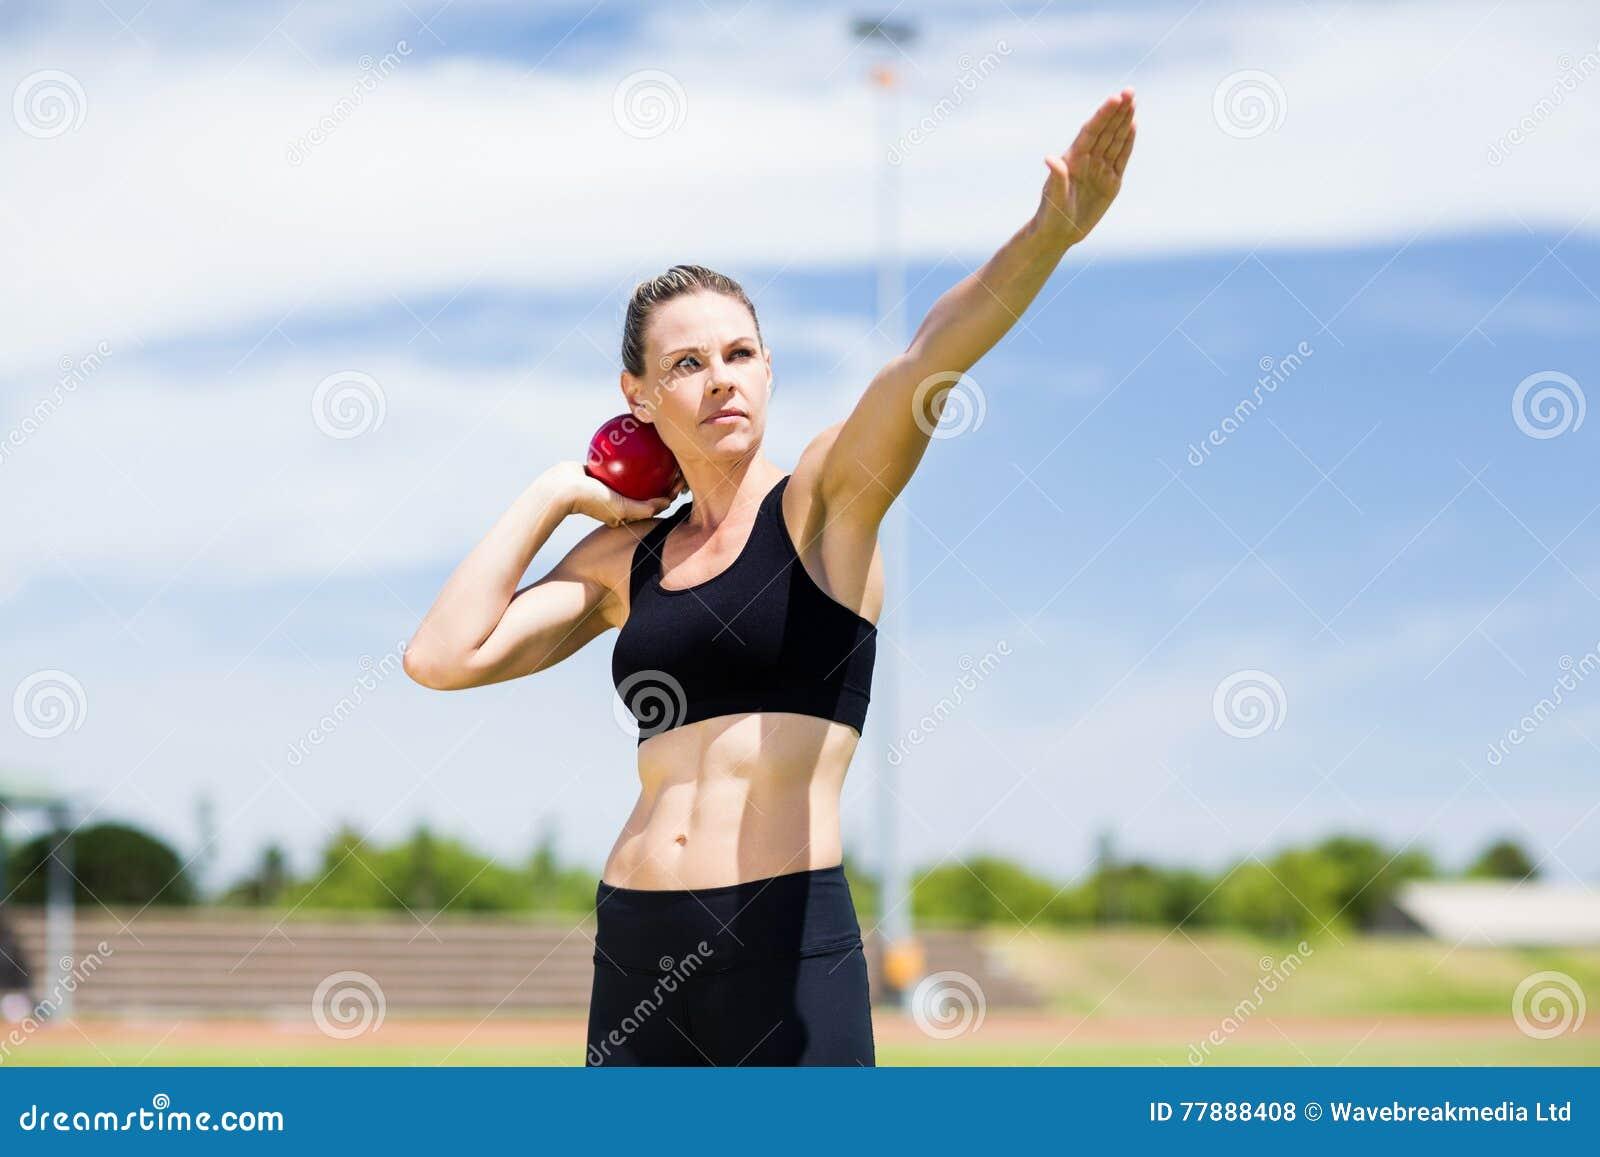 Confident female athlete preparing to throw shot put ball